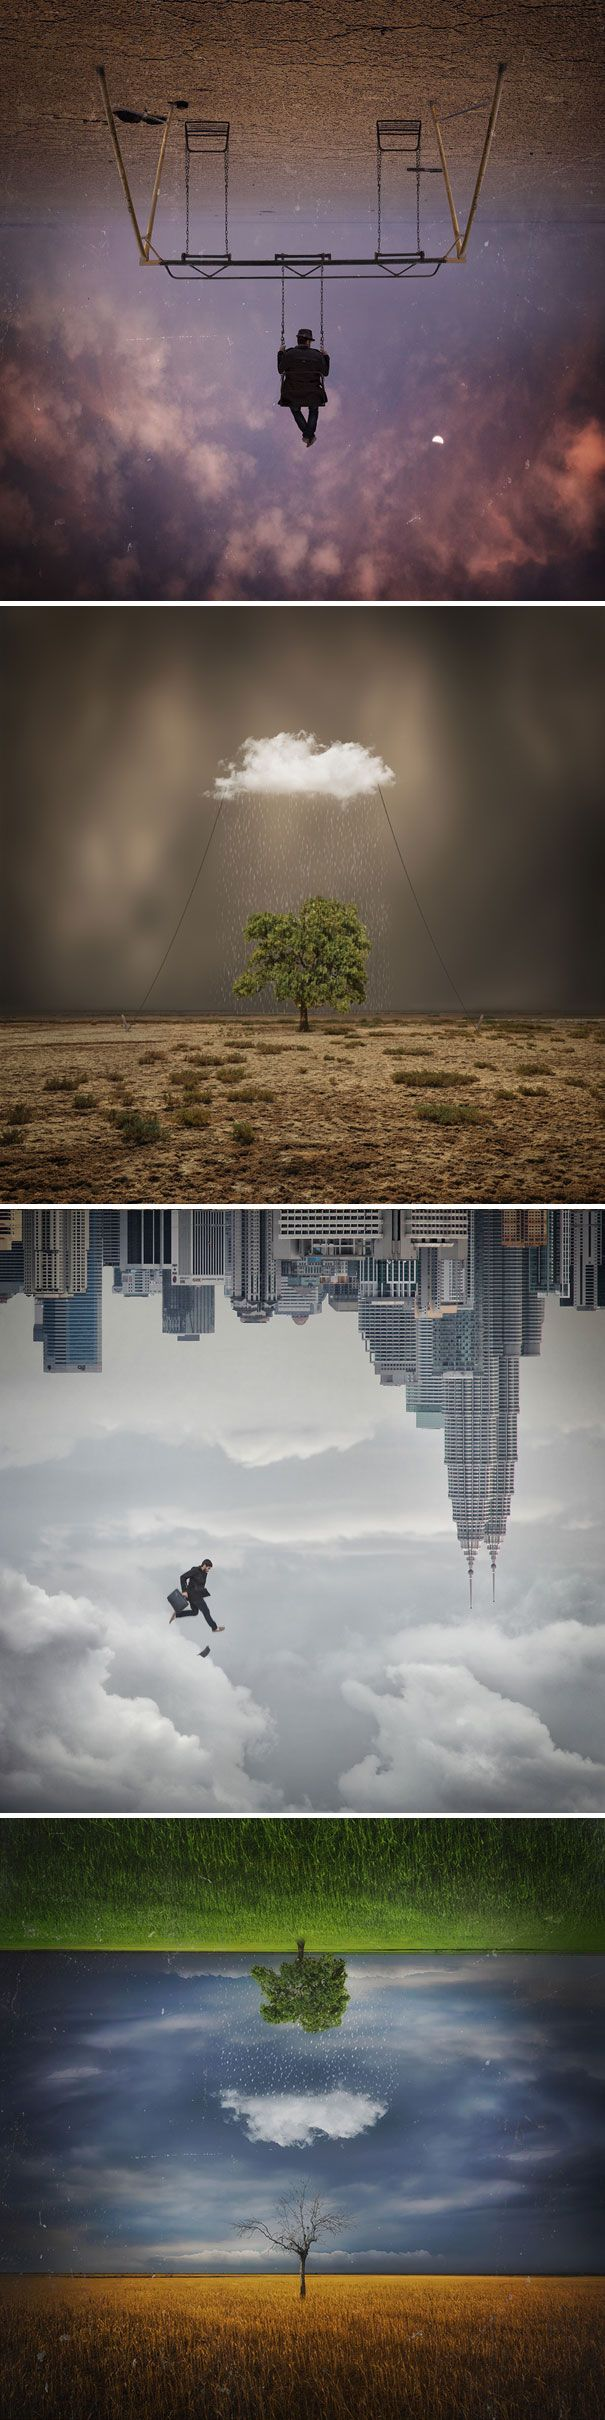 photo-manipulations-hossein-zare